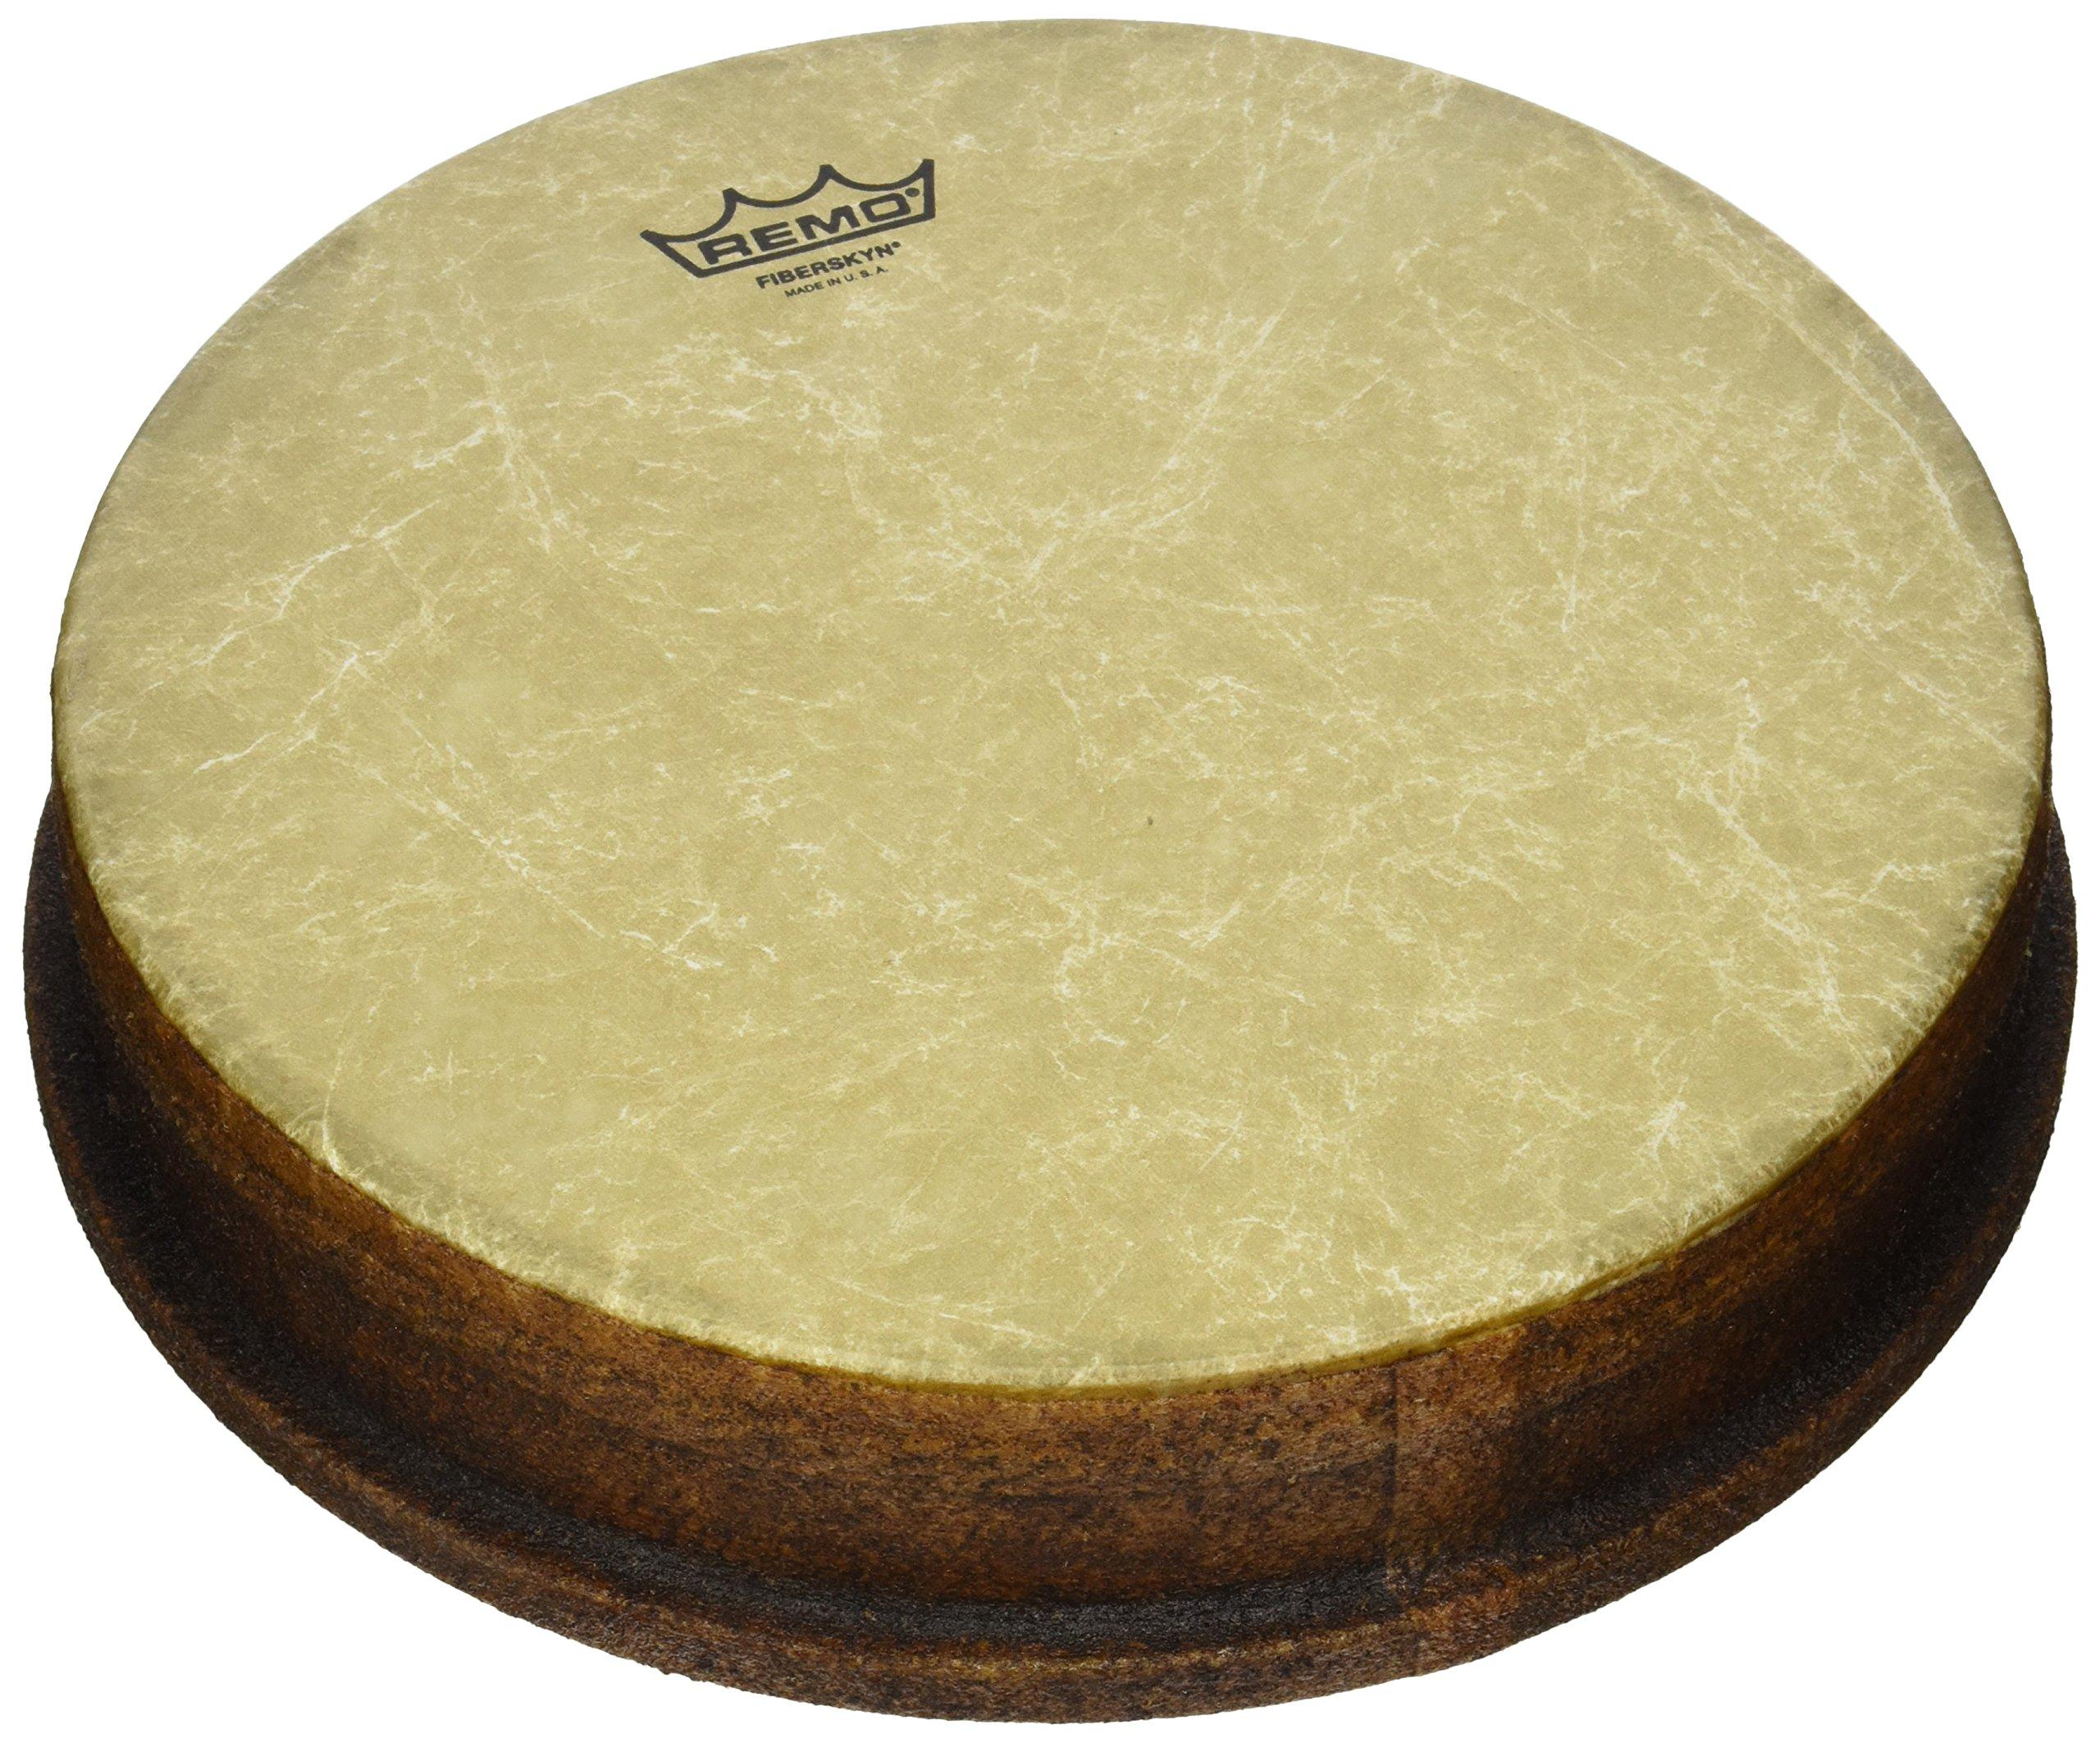 Remo Mondo Fiberskyn Djembe Drumhead, 12''